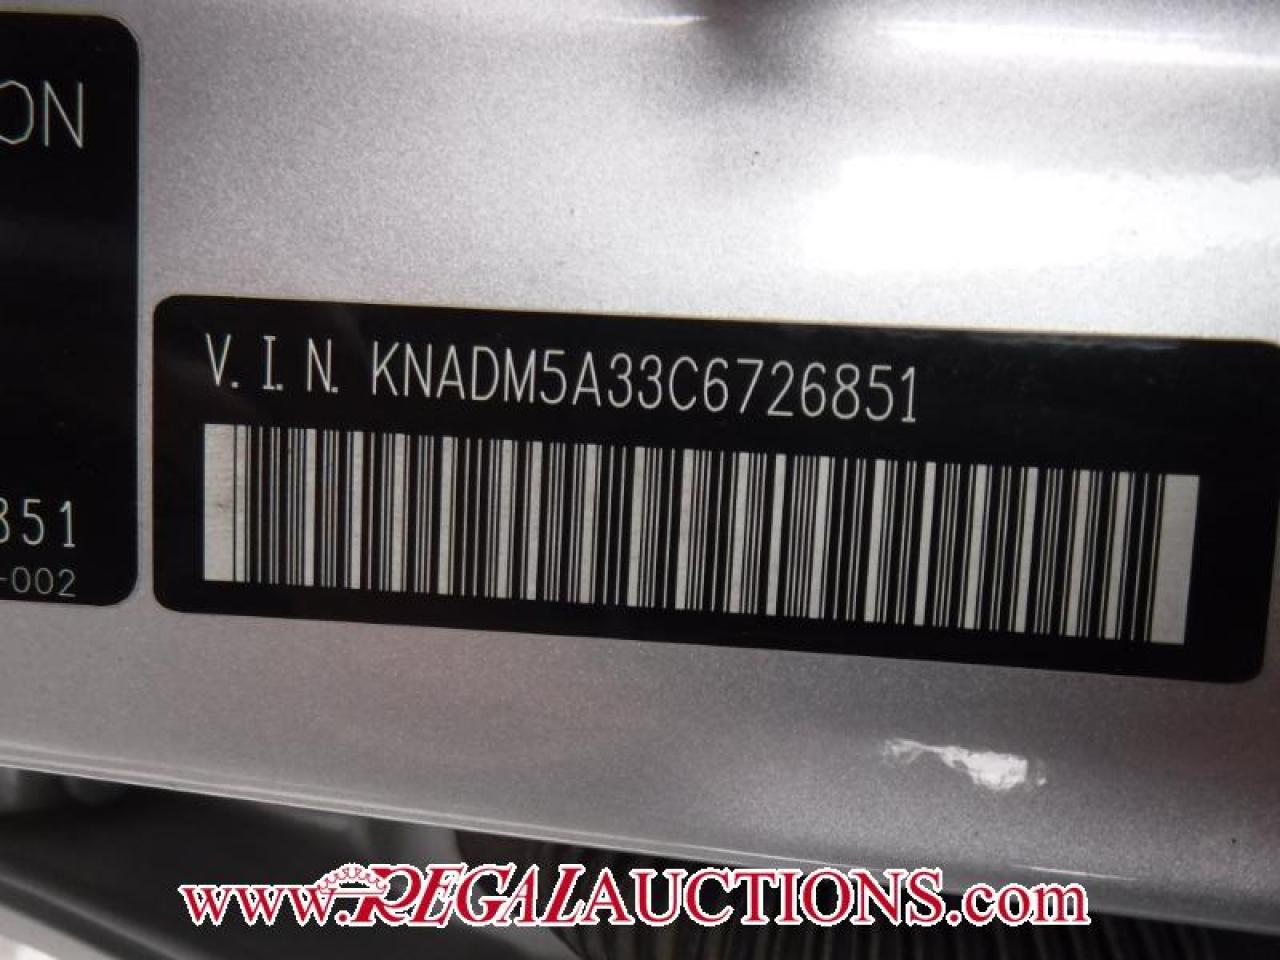 2012 Kia RIO LX 4D HATCHBACK 6SP